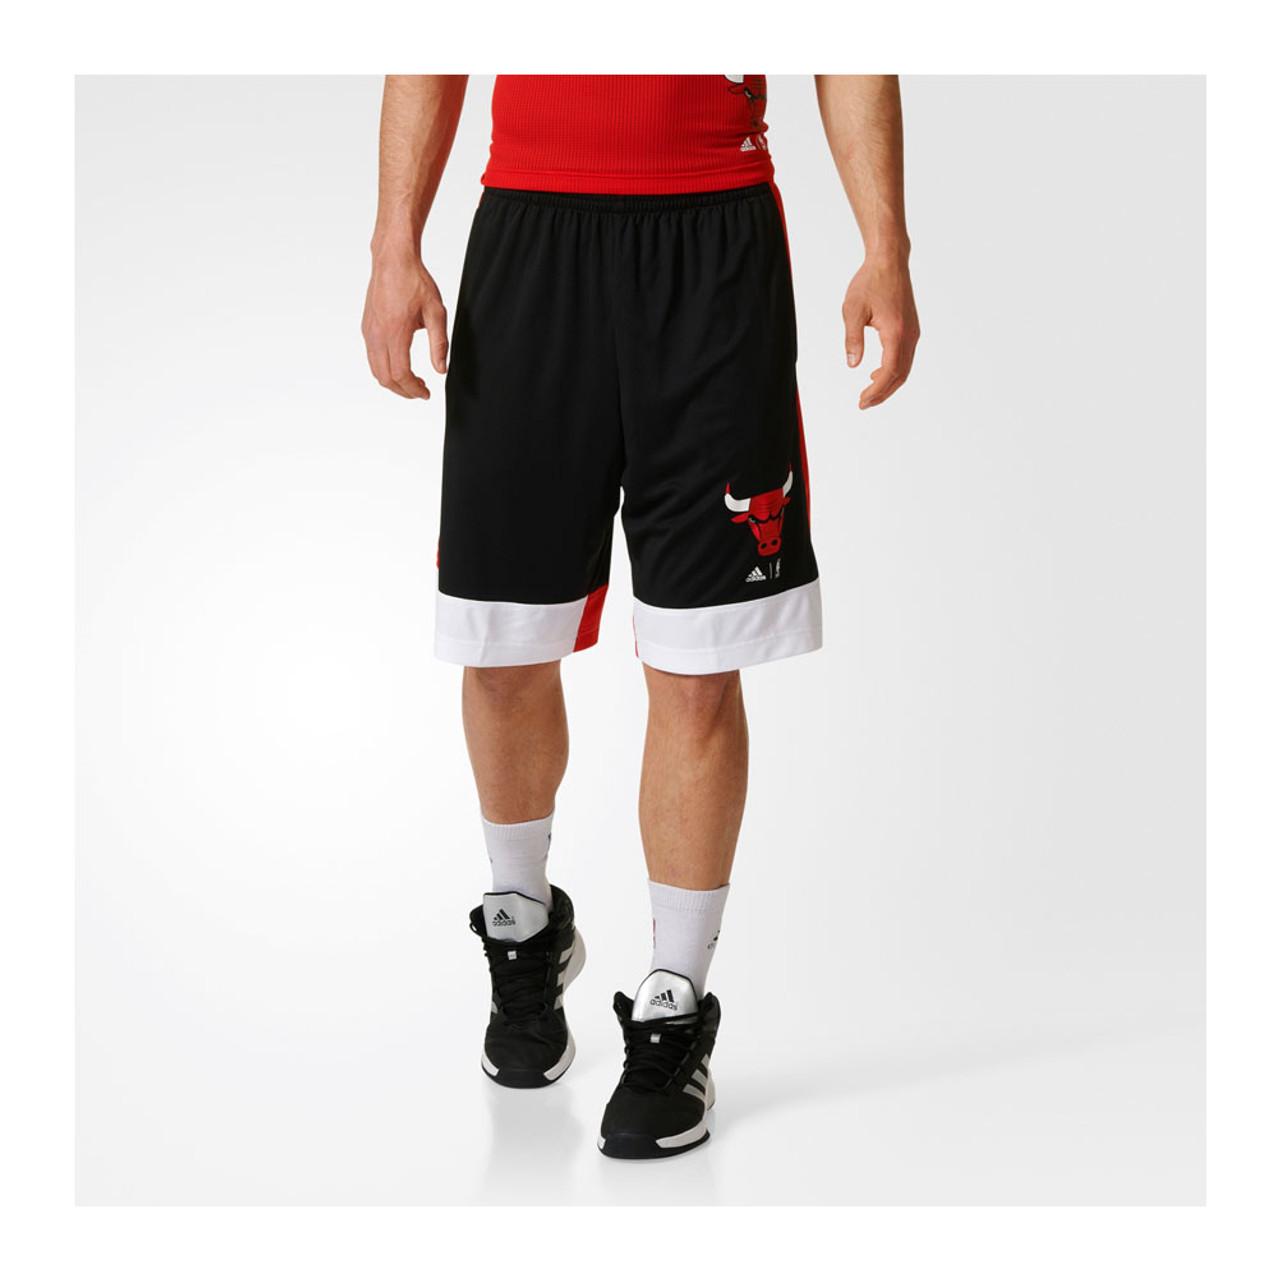 ADIDAS chicago bulls basketball shorts [black]